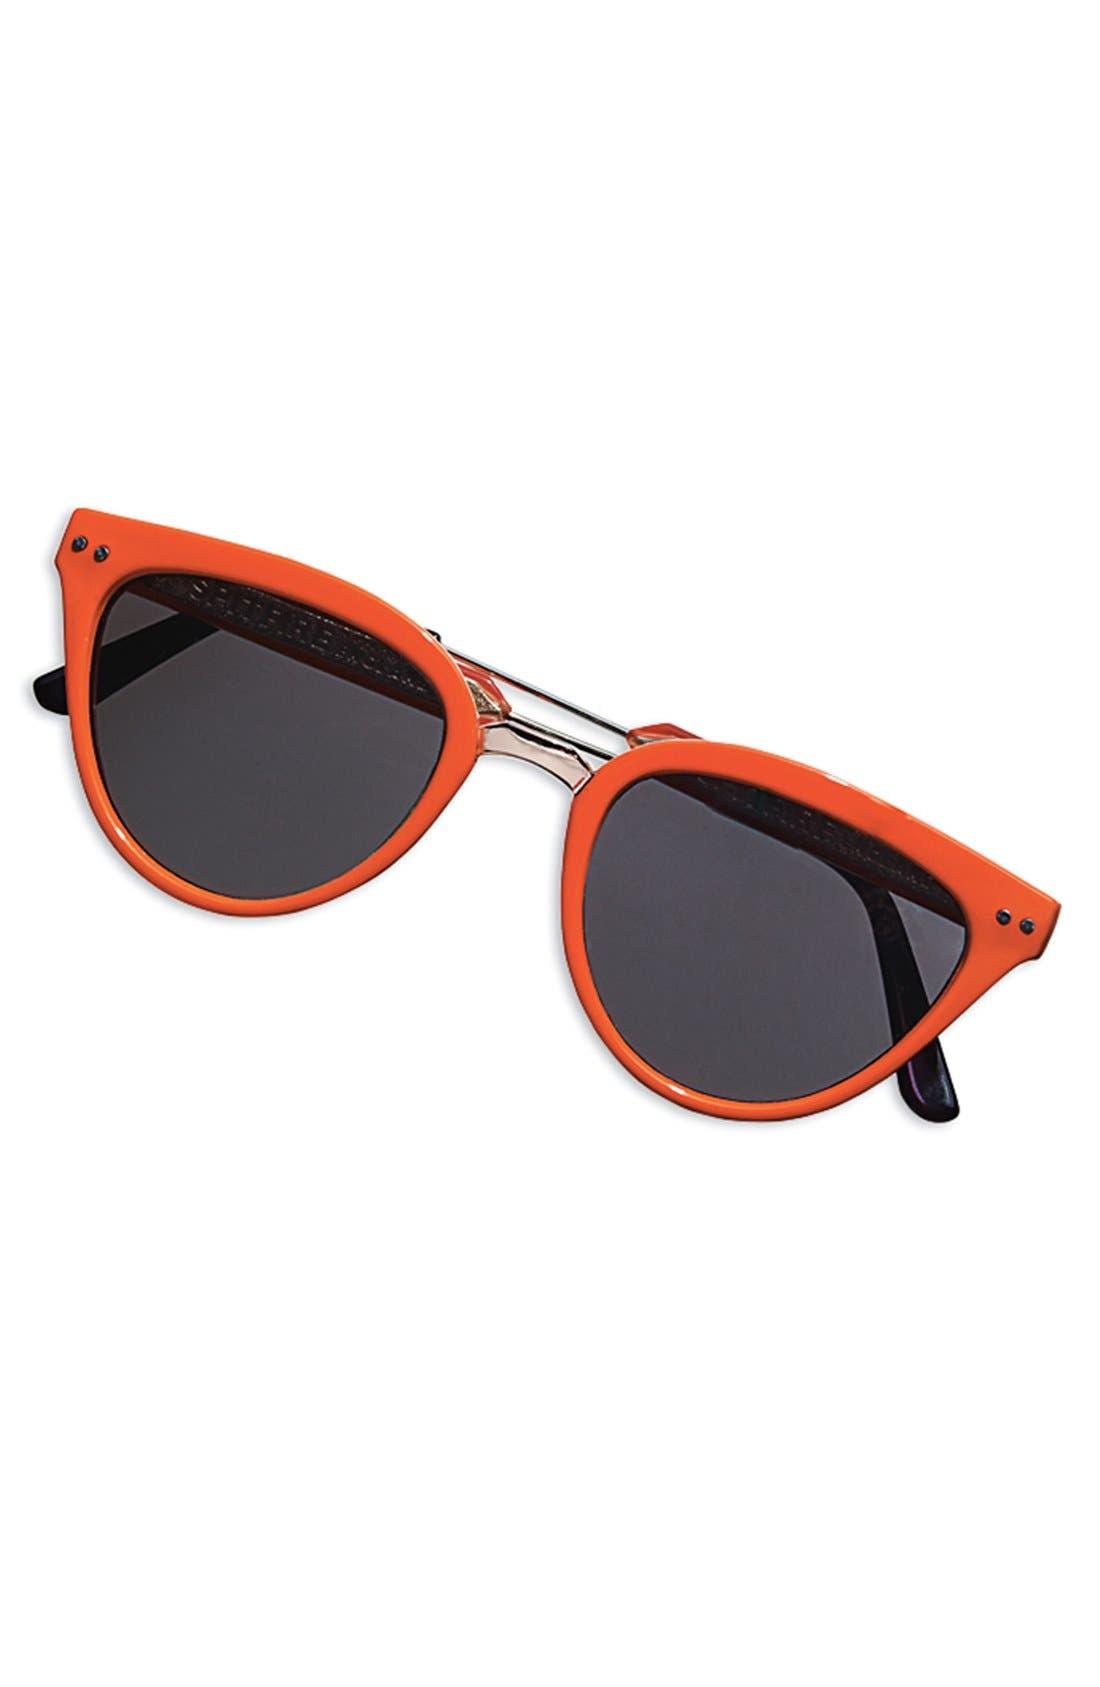 'Yazhoo' 50mm Sunglasses,                             Alternate thumbnail 2, color,